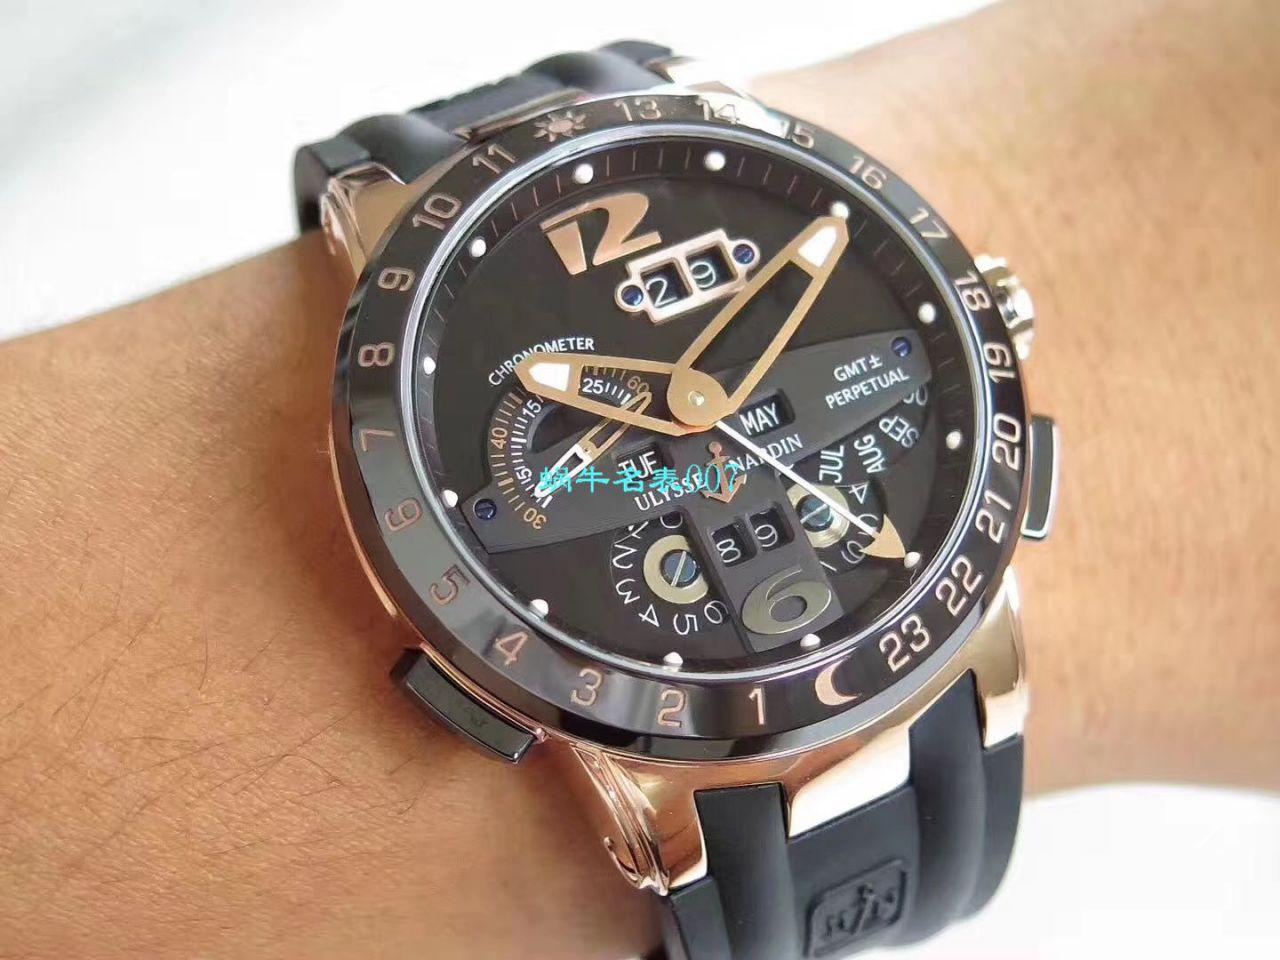 【TWA厂一比一Ulysse Nardin精仿手表】雅典表复杂功能系列320-00-3腕表 / YD019